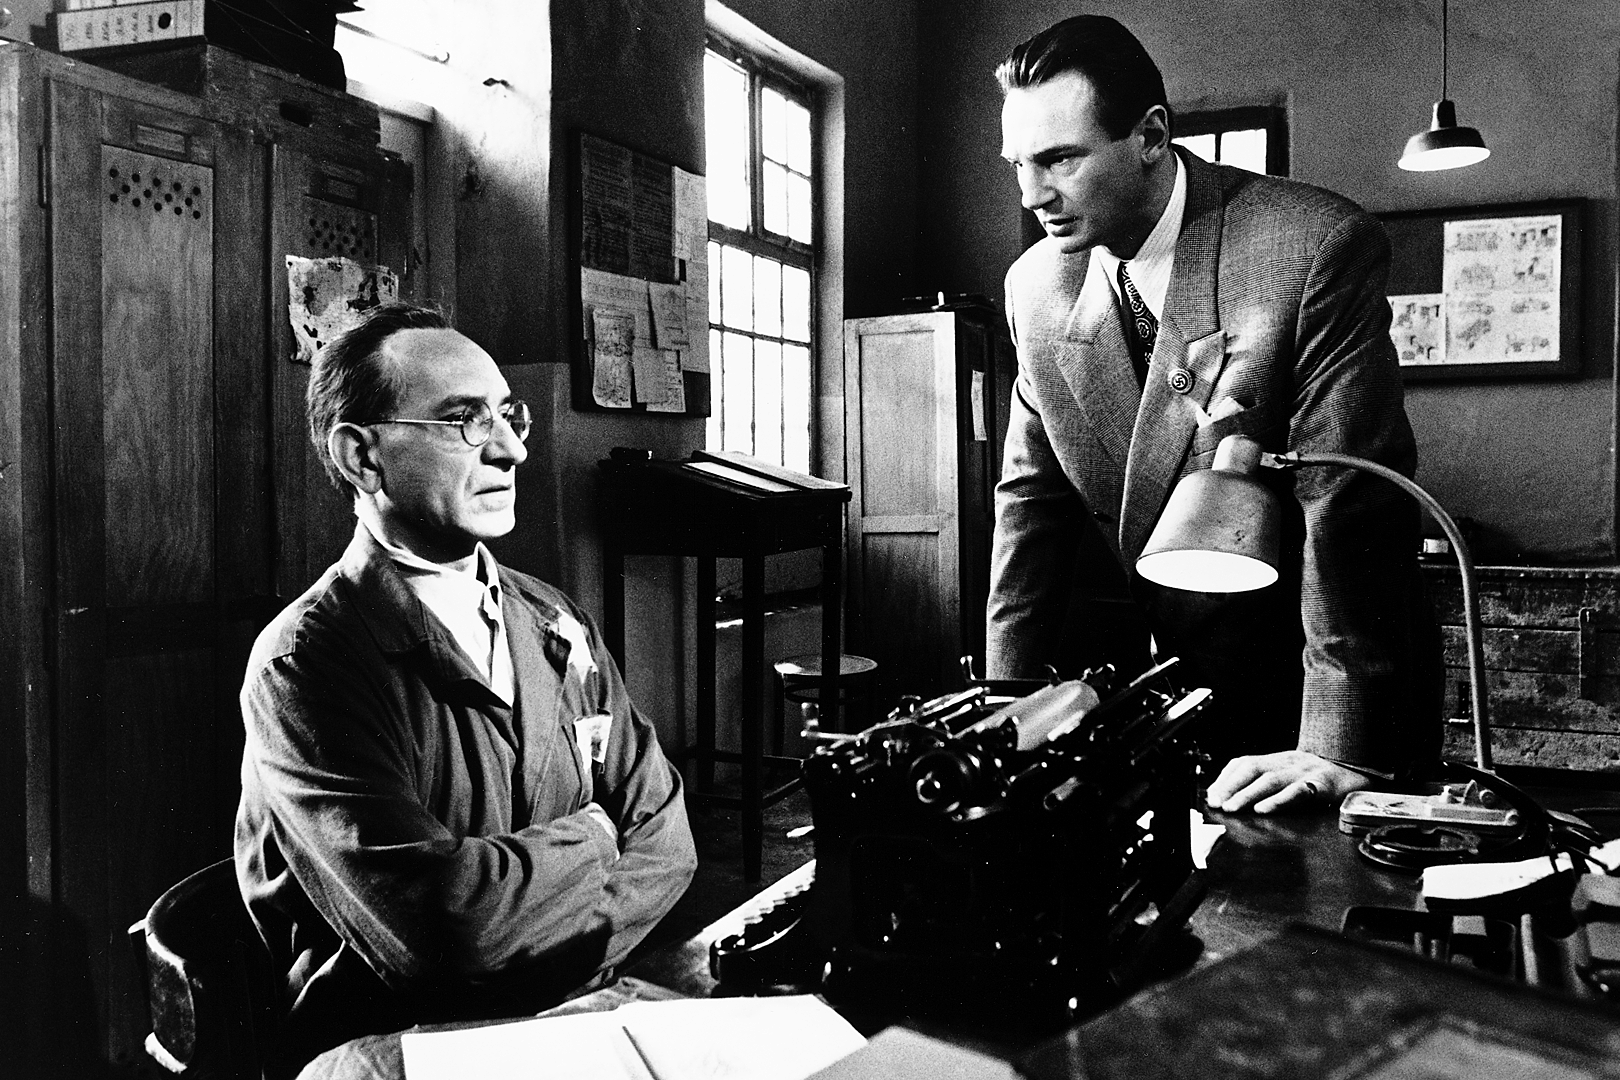 Schindler's List (1993) - Directed by: Steven SpielbergWritten by: Thomas Keneally (book) & Steven Zaillian